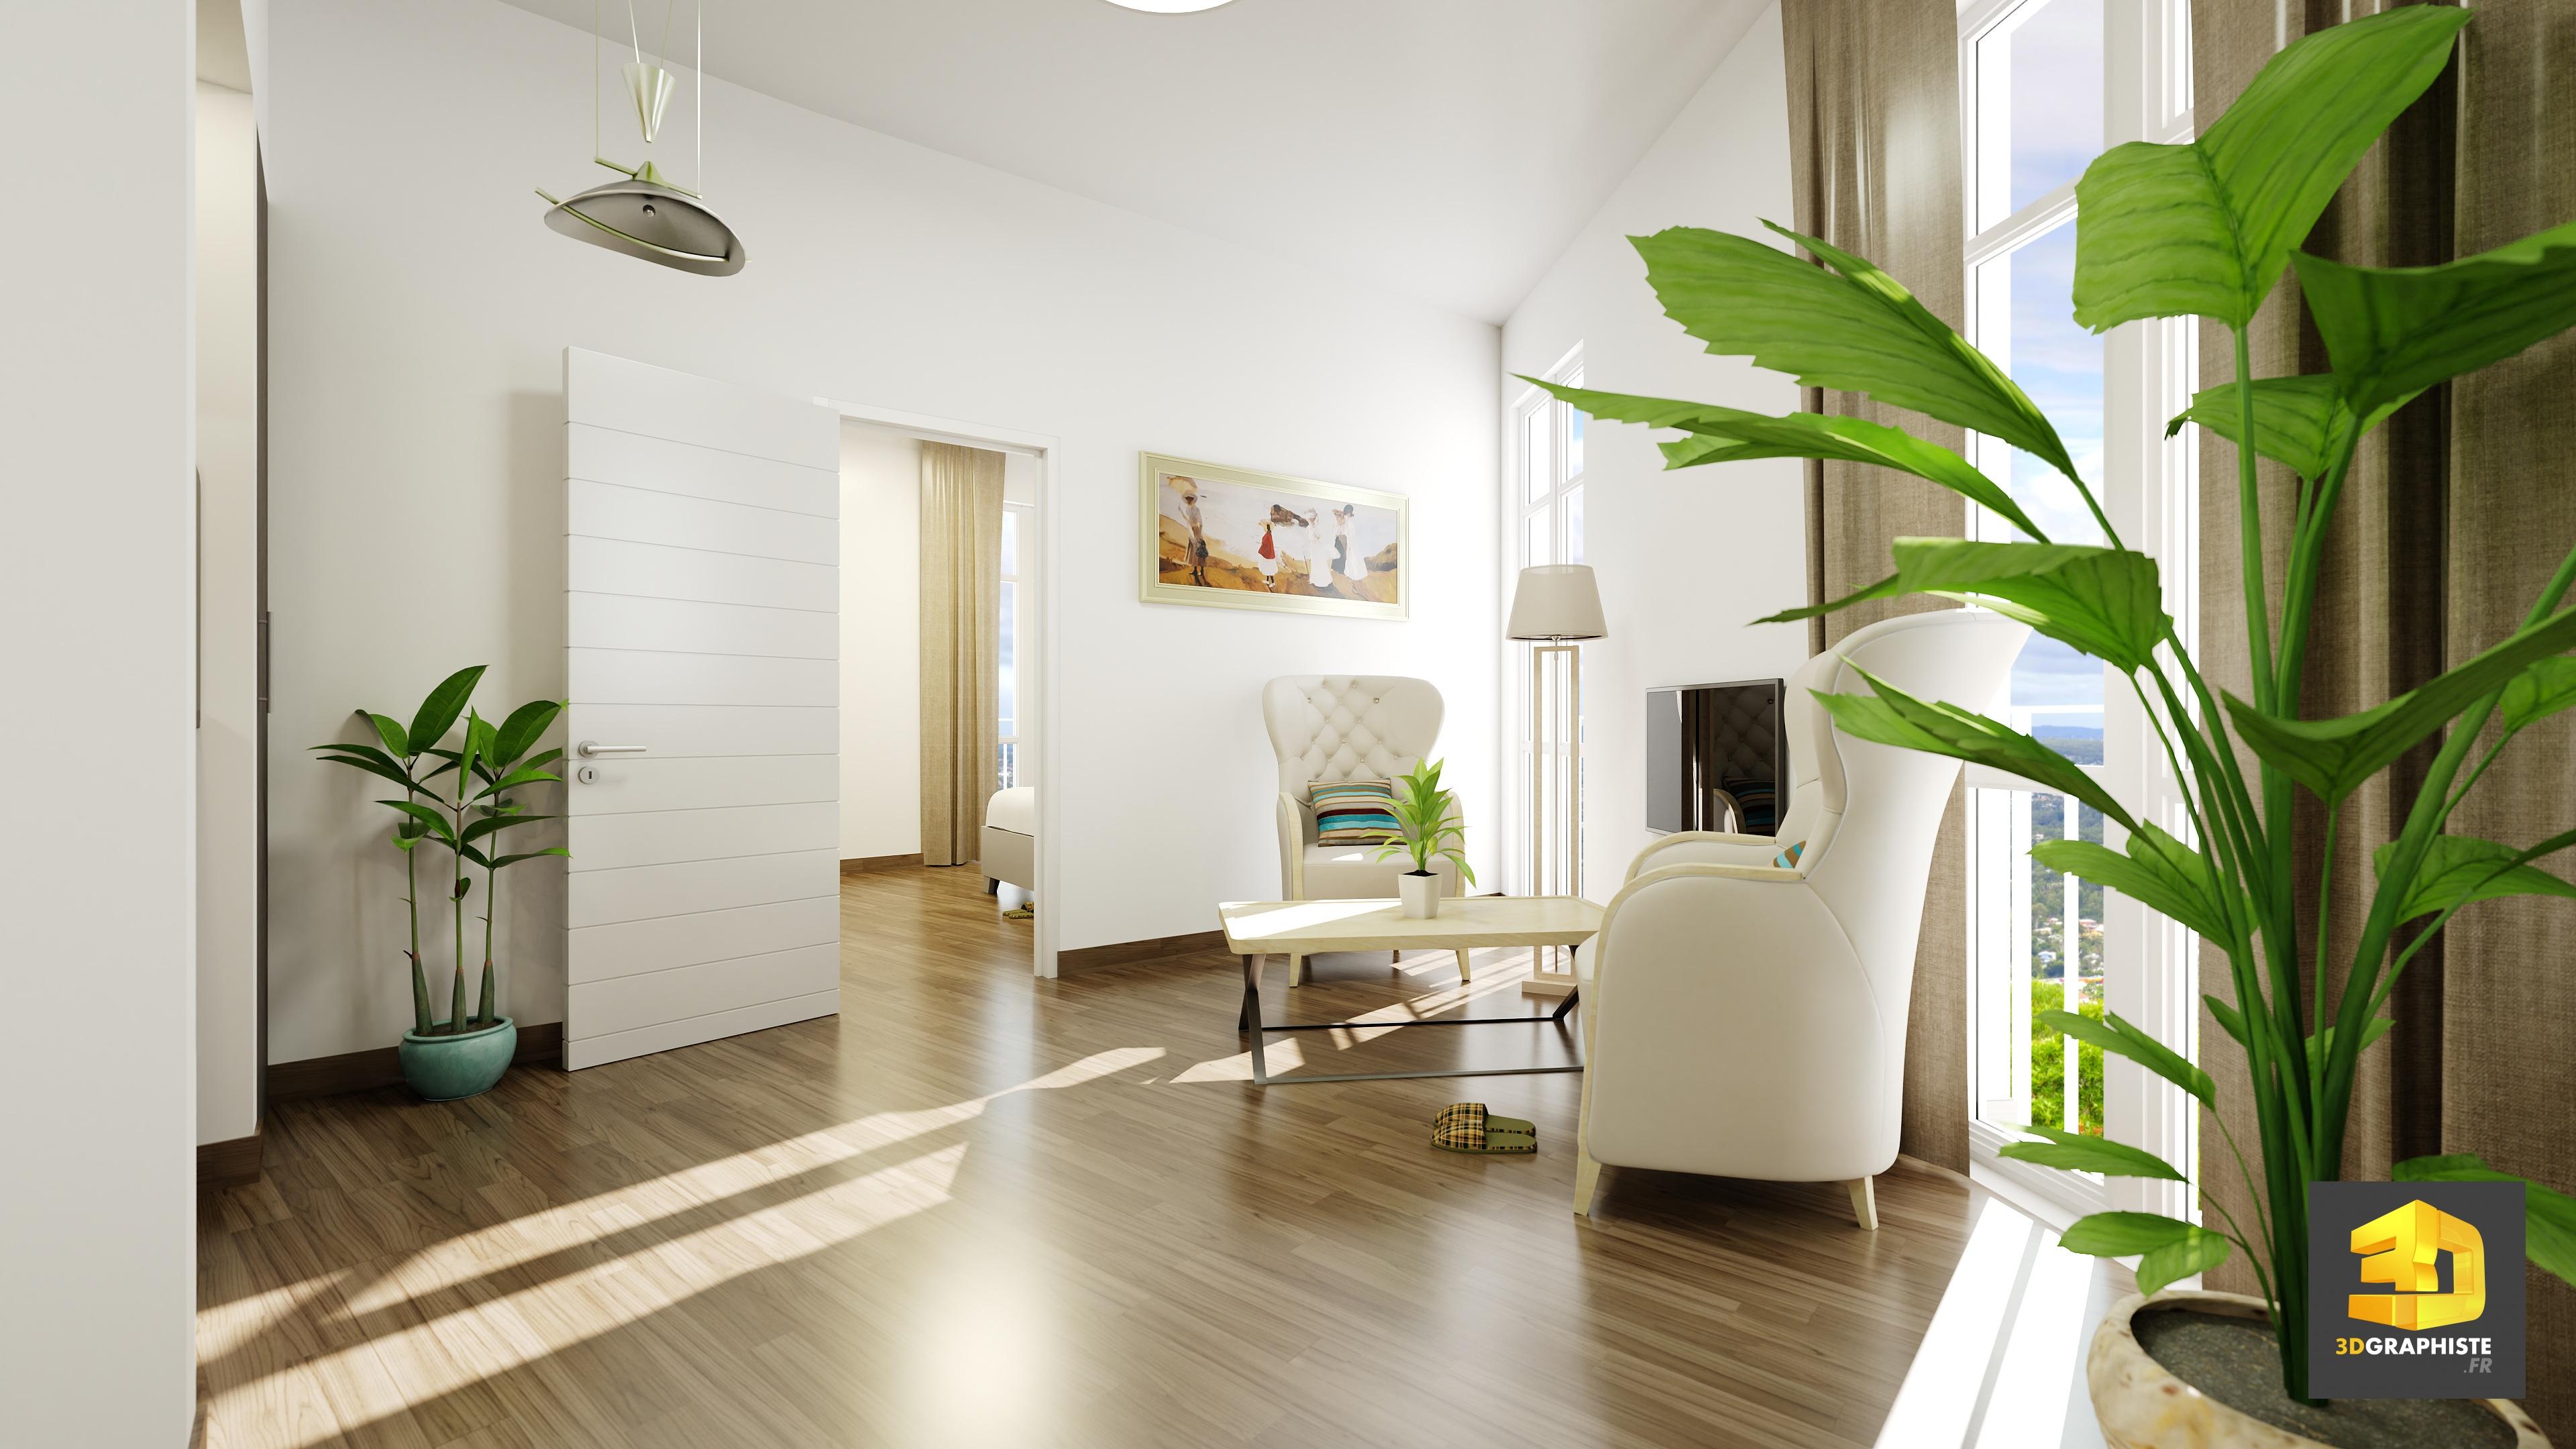 infographiste 3d freelance paris portfolio tarifs 3dgraphiste fr. Black Bedroom Furniture Sets. Home Design Ideas